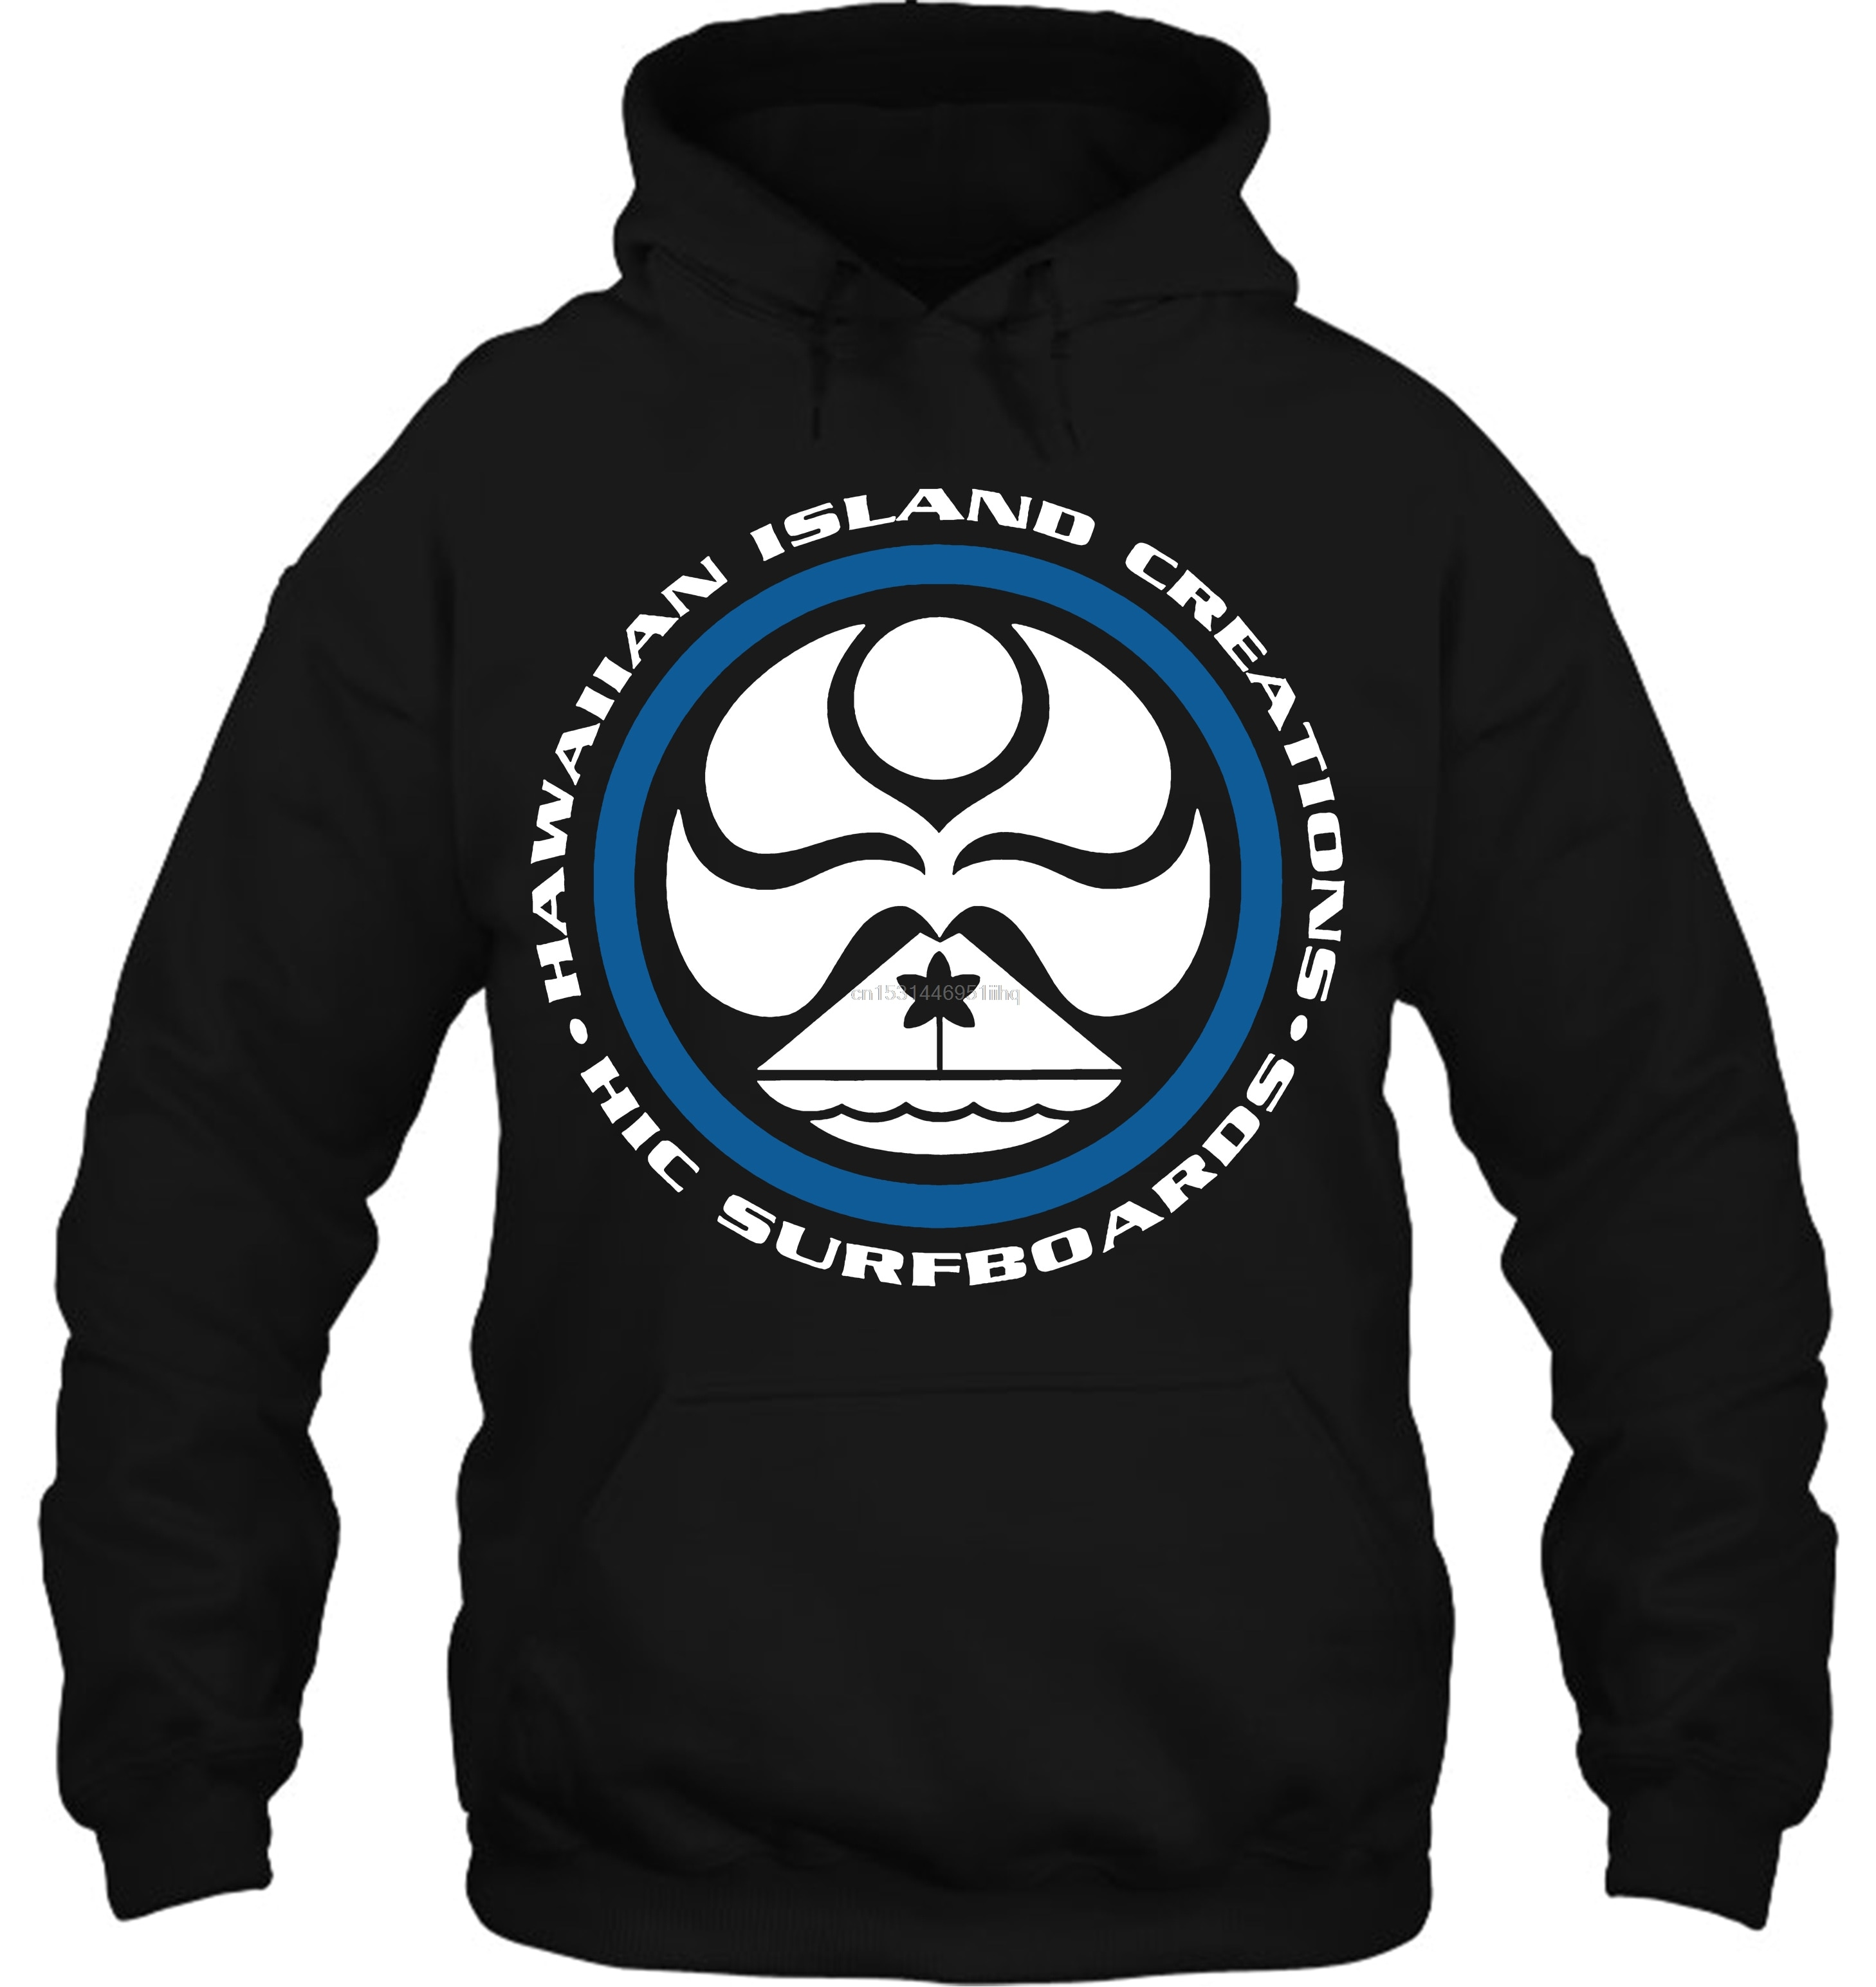 Hoodie masculino novo hic ilha havaiana criações logotipo t sz s 2xl feminino streetwear